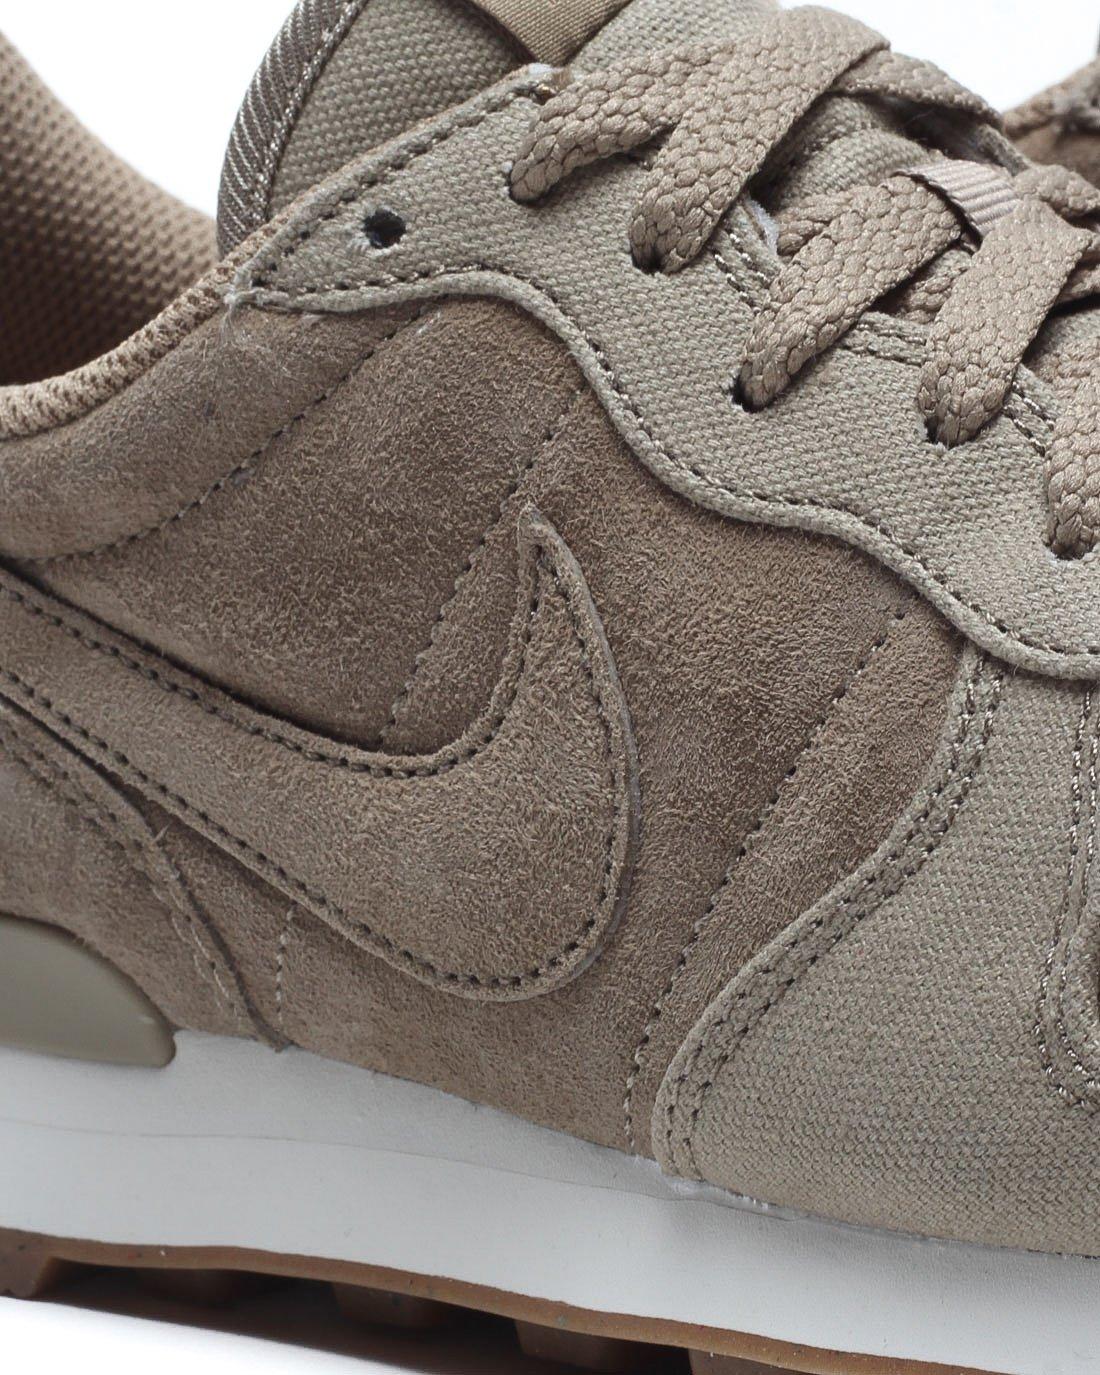 Nike Internationalist Premium 828043-200 Herren Schuhe Größe: 40,5 EU